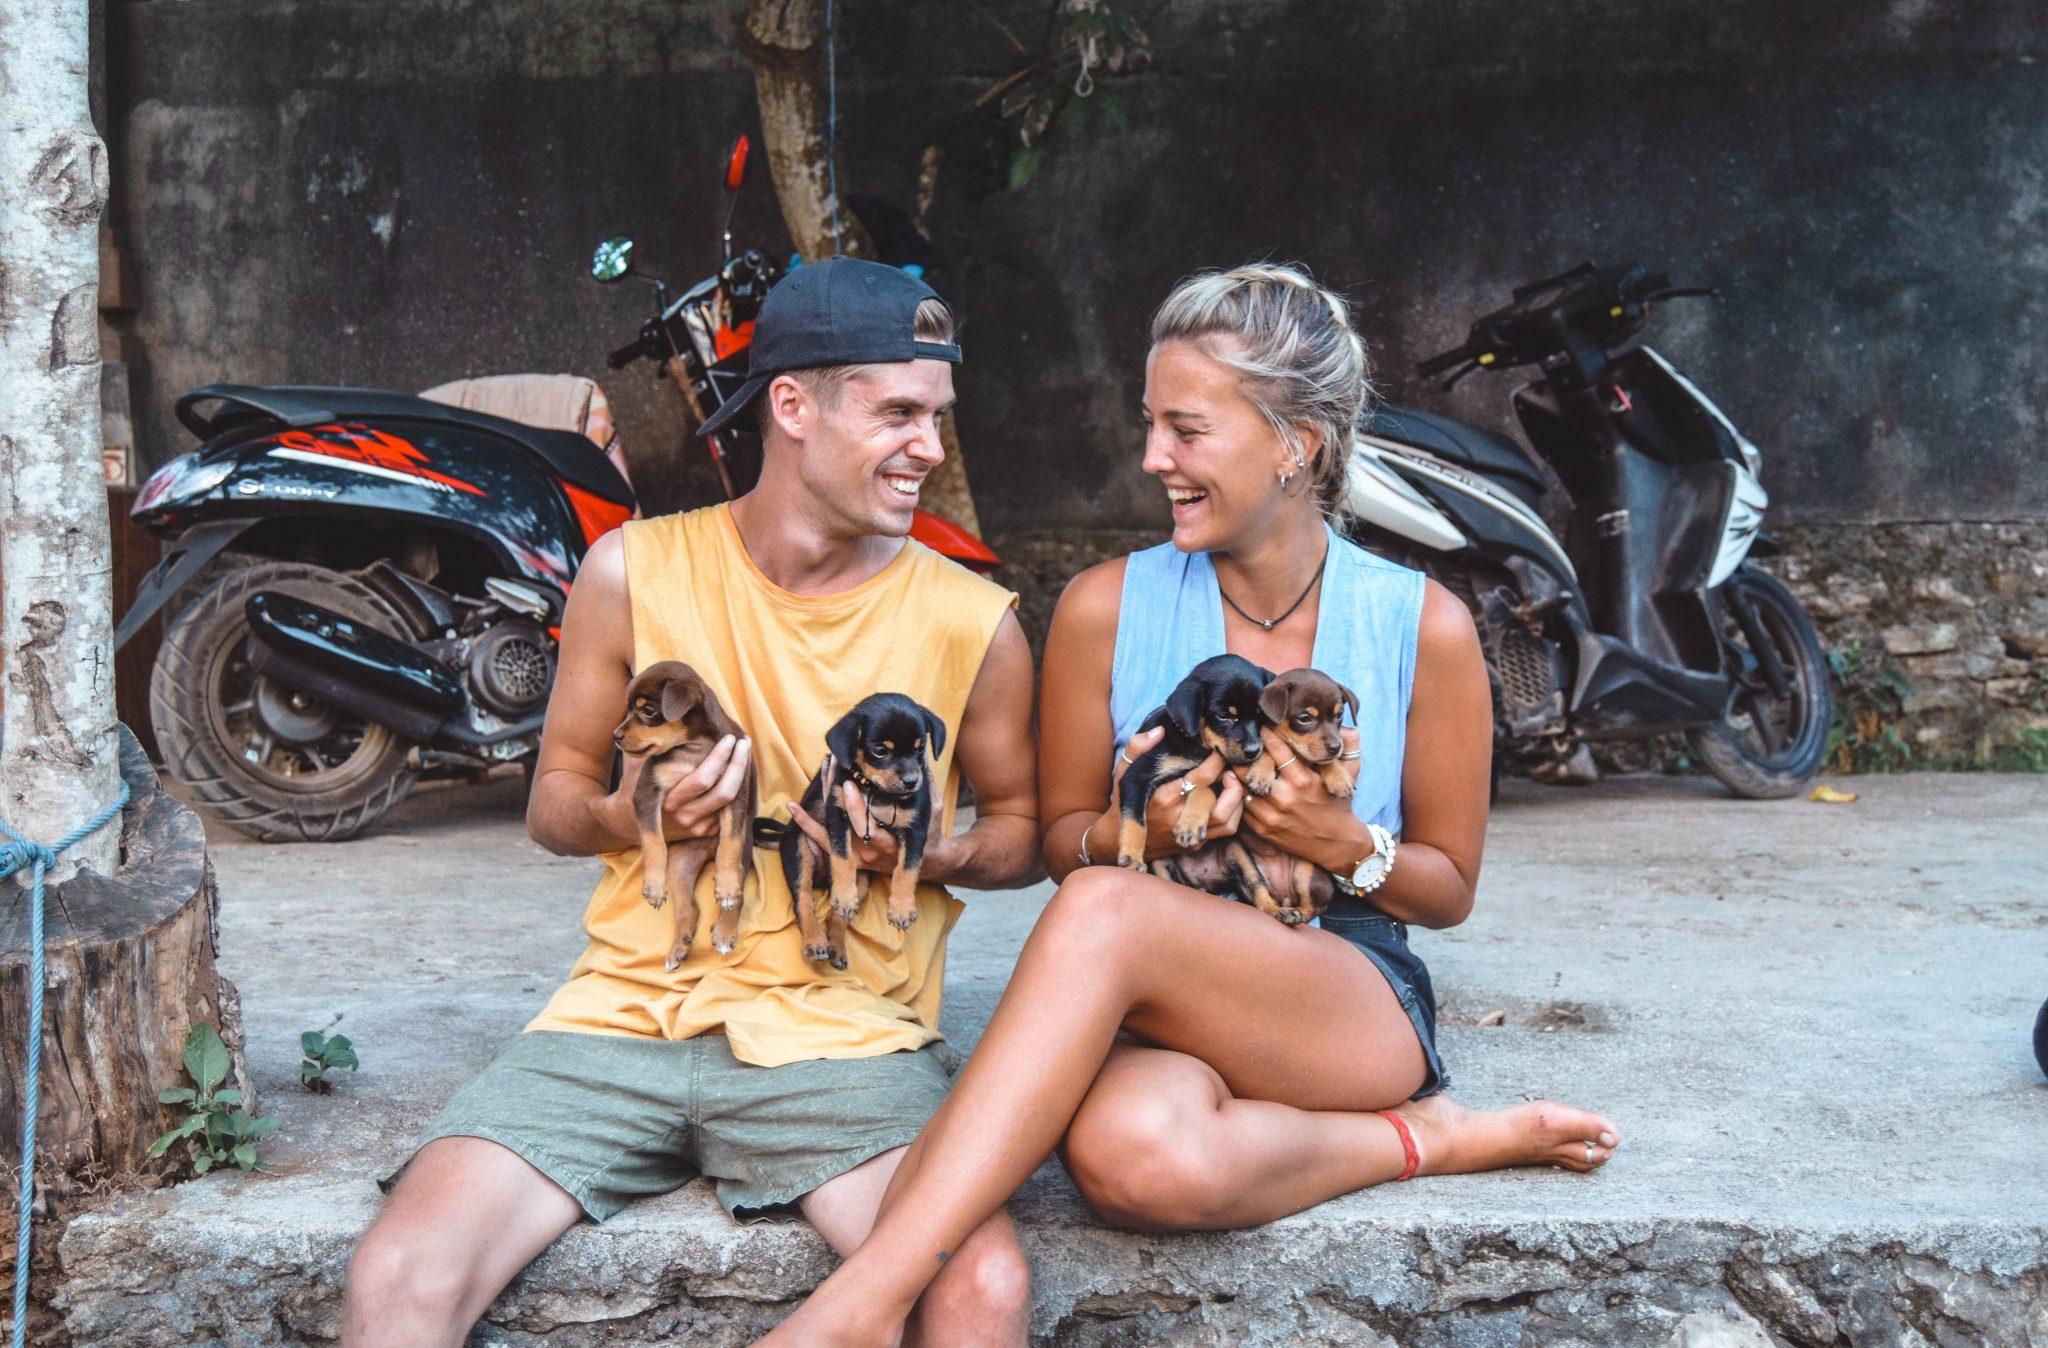 Wanderers & Warriors - Charlie & Lauren UK Travel Couple - Blue Lagoon Nusa Cenengan Bali - Blue Lagoon Bali - Cliff Jumping Nusa Ceningan - Blue Lagoon Nusa Lembongan - Puppies In Bali